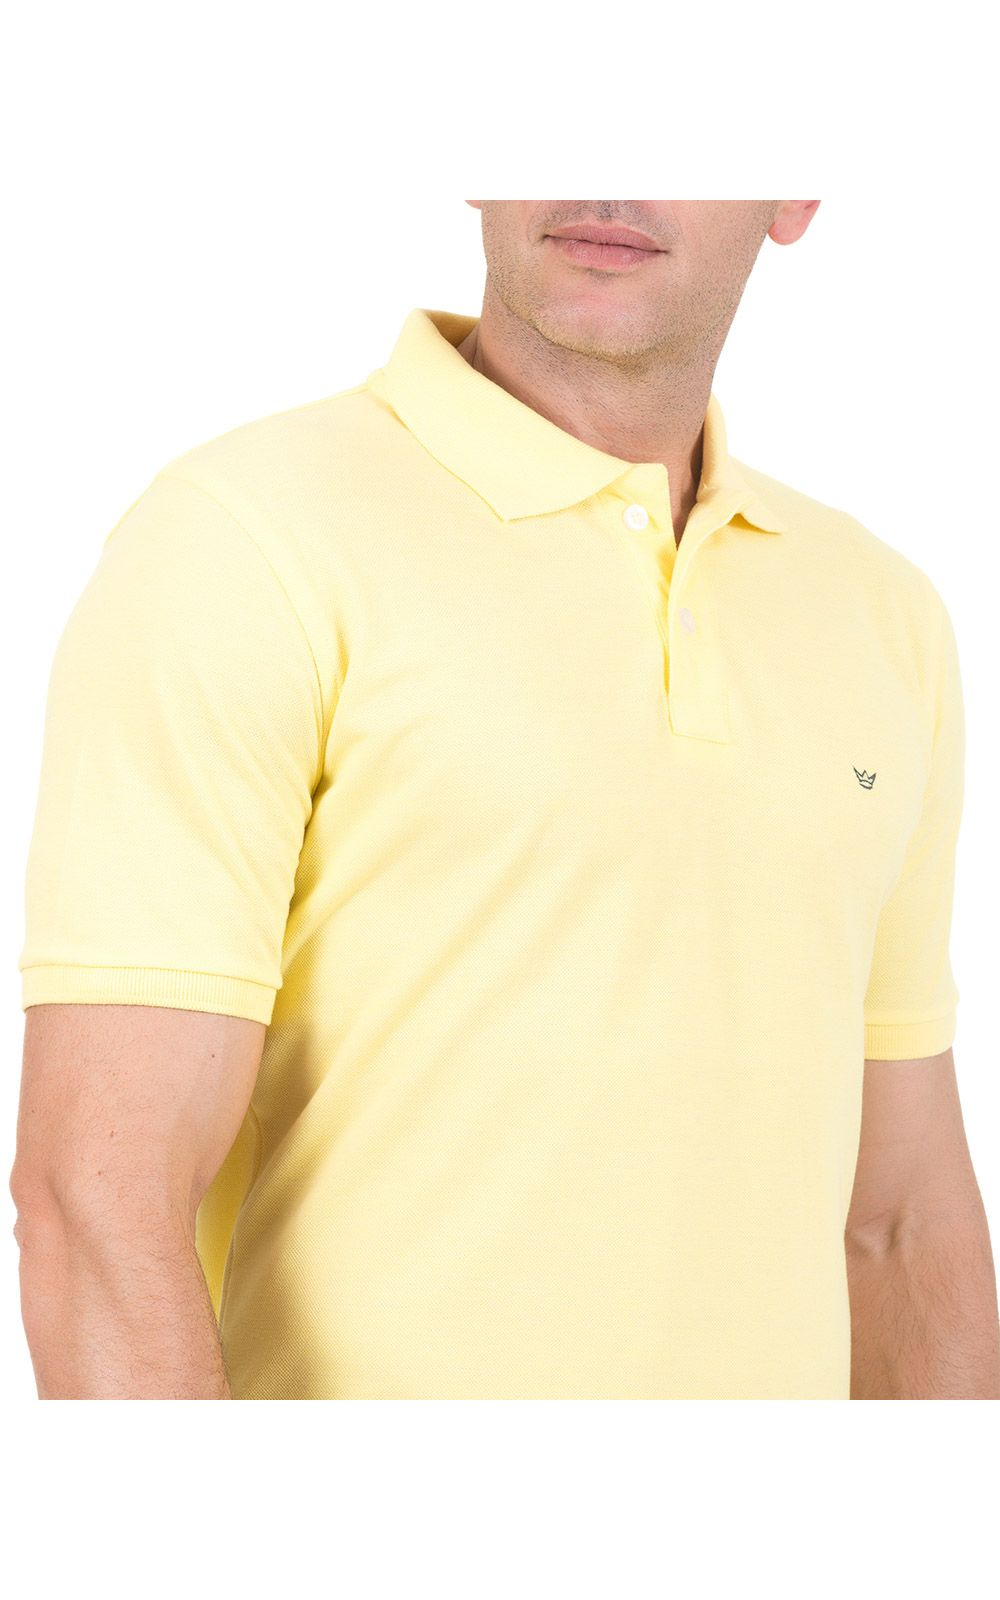 Foto 3 - Camisa Polo Masculina Amarela Lisa